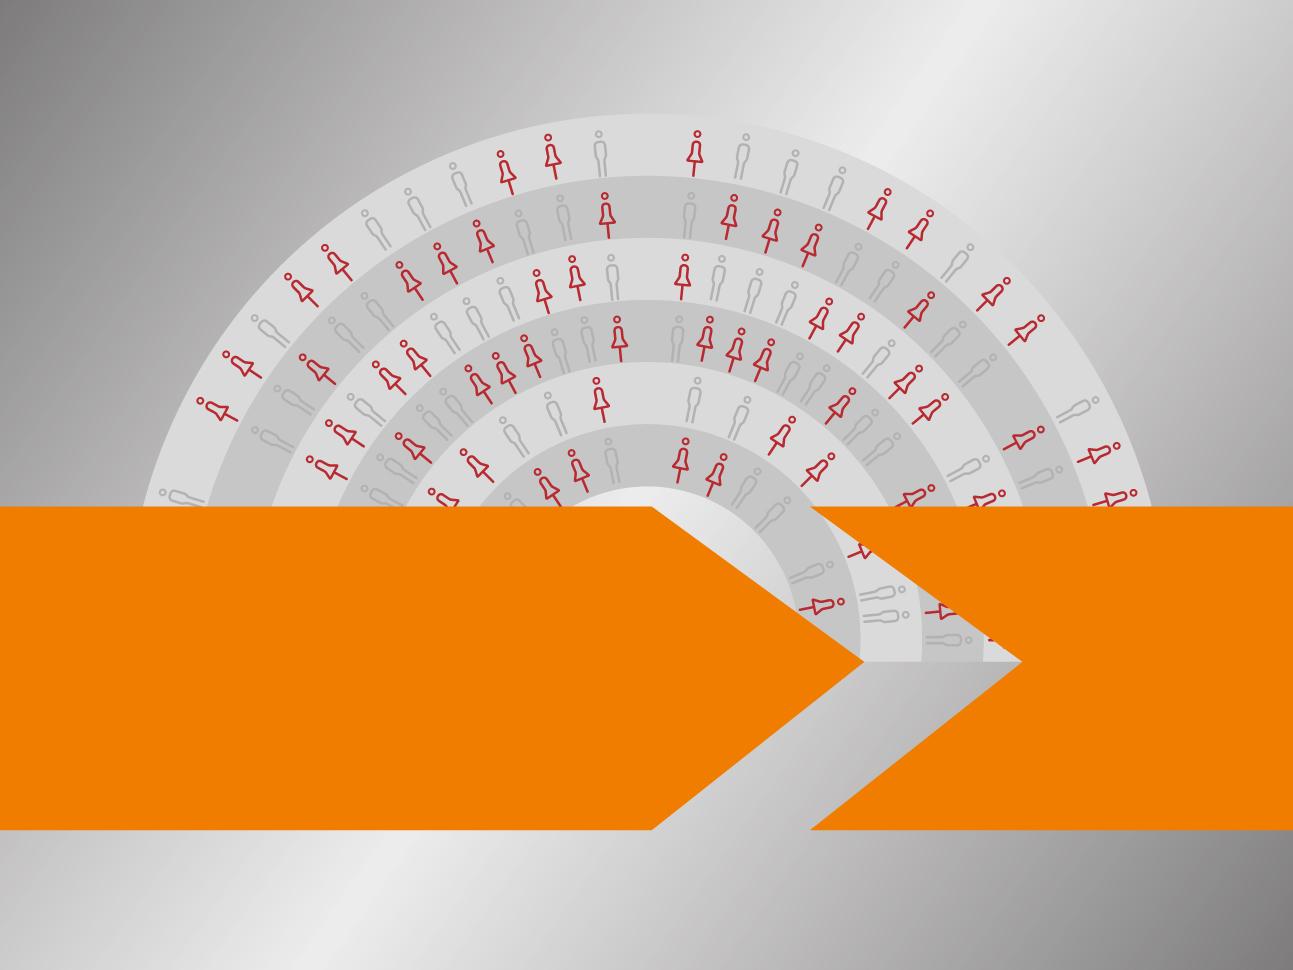 martin_zech_design_projekt-design_paritaet-in-der-politik_wegweiser_key-visual